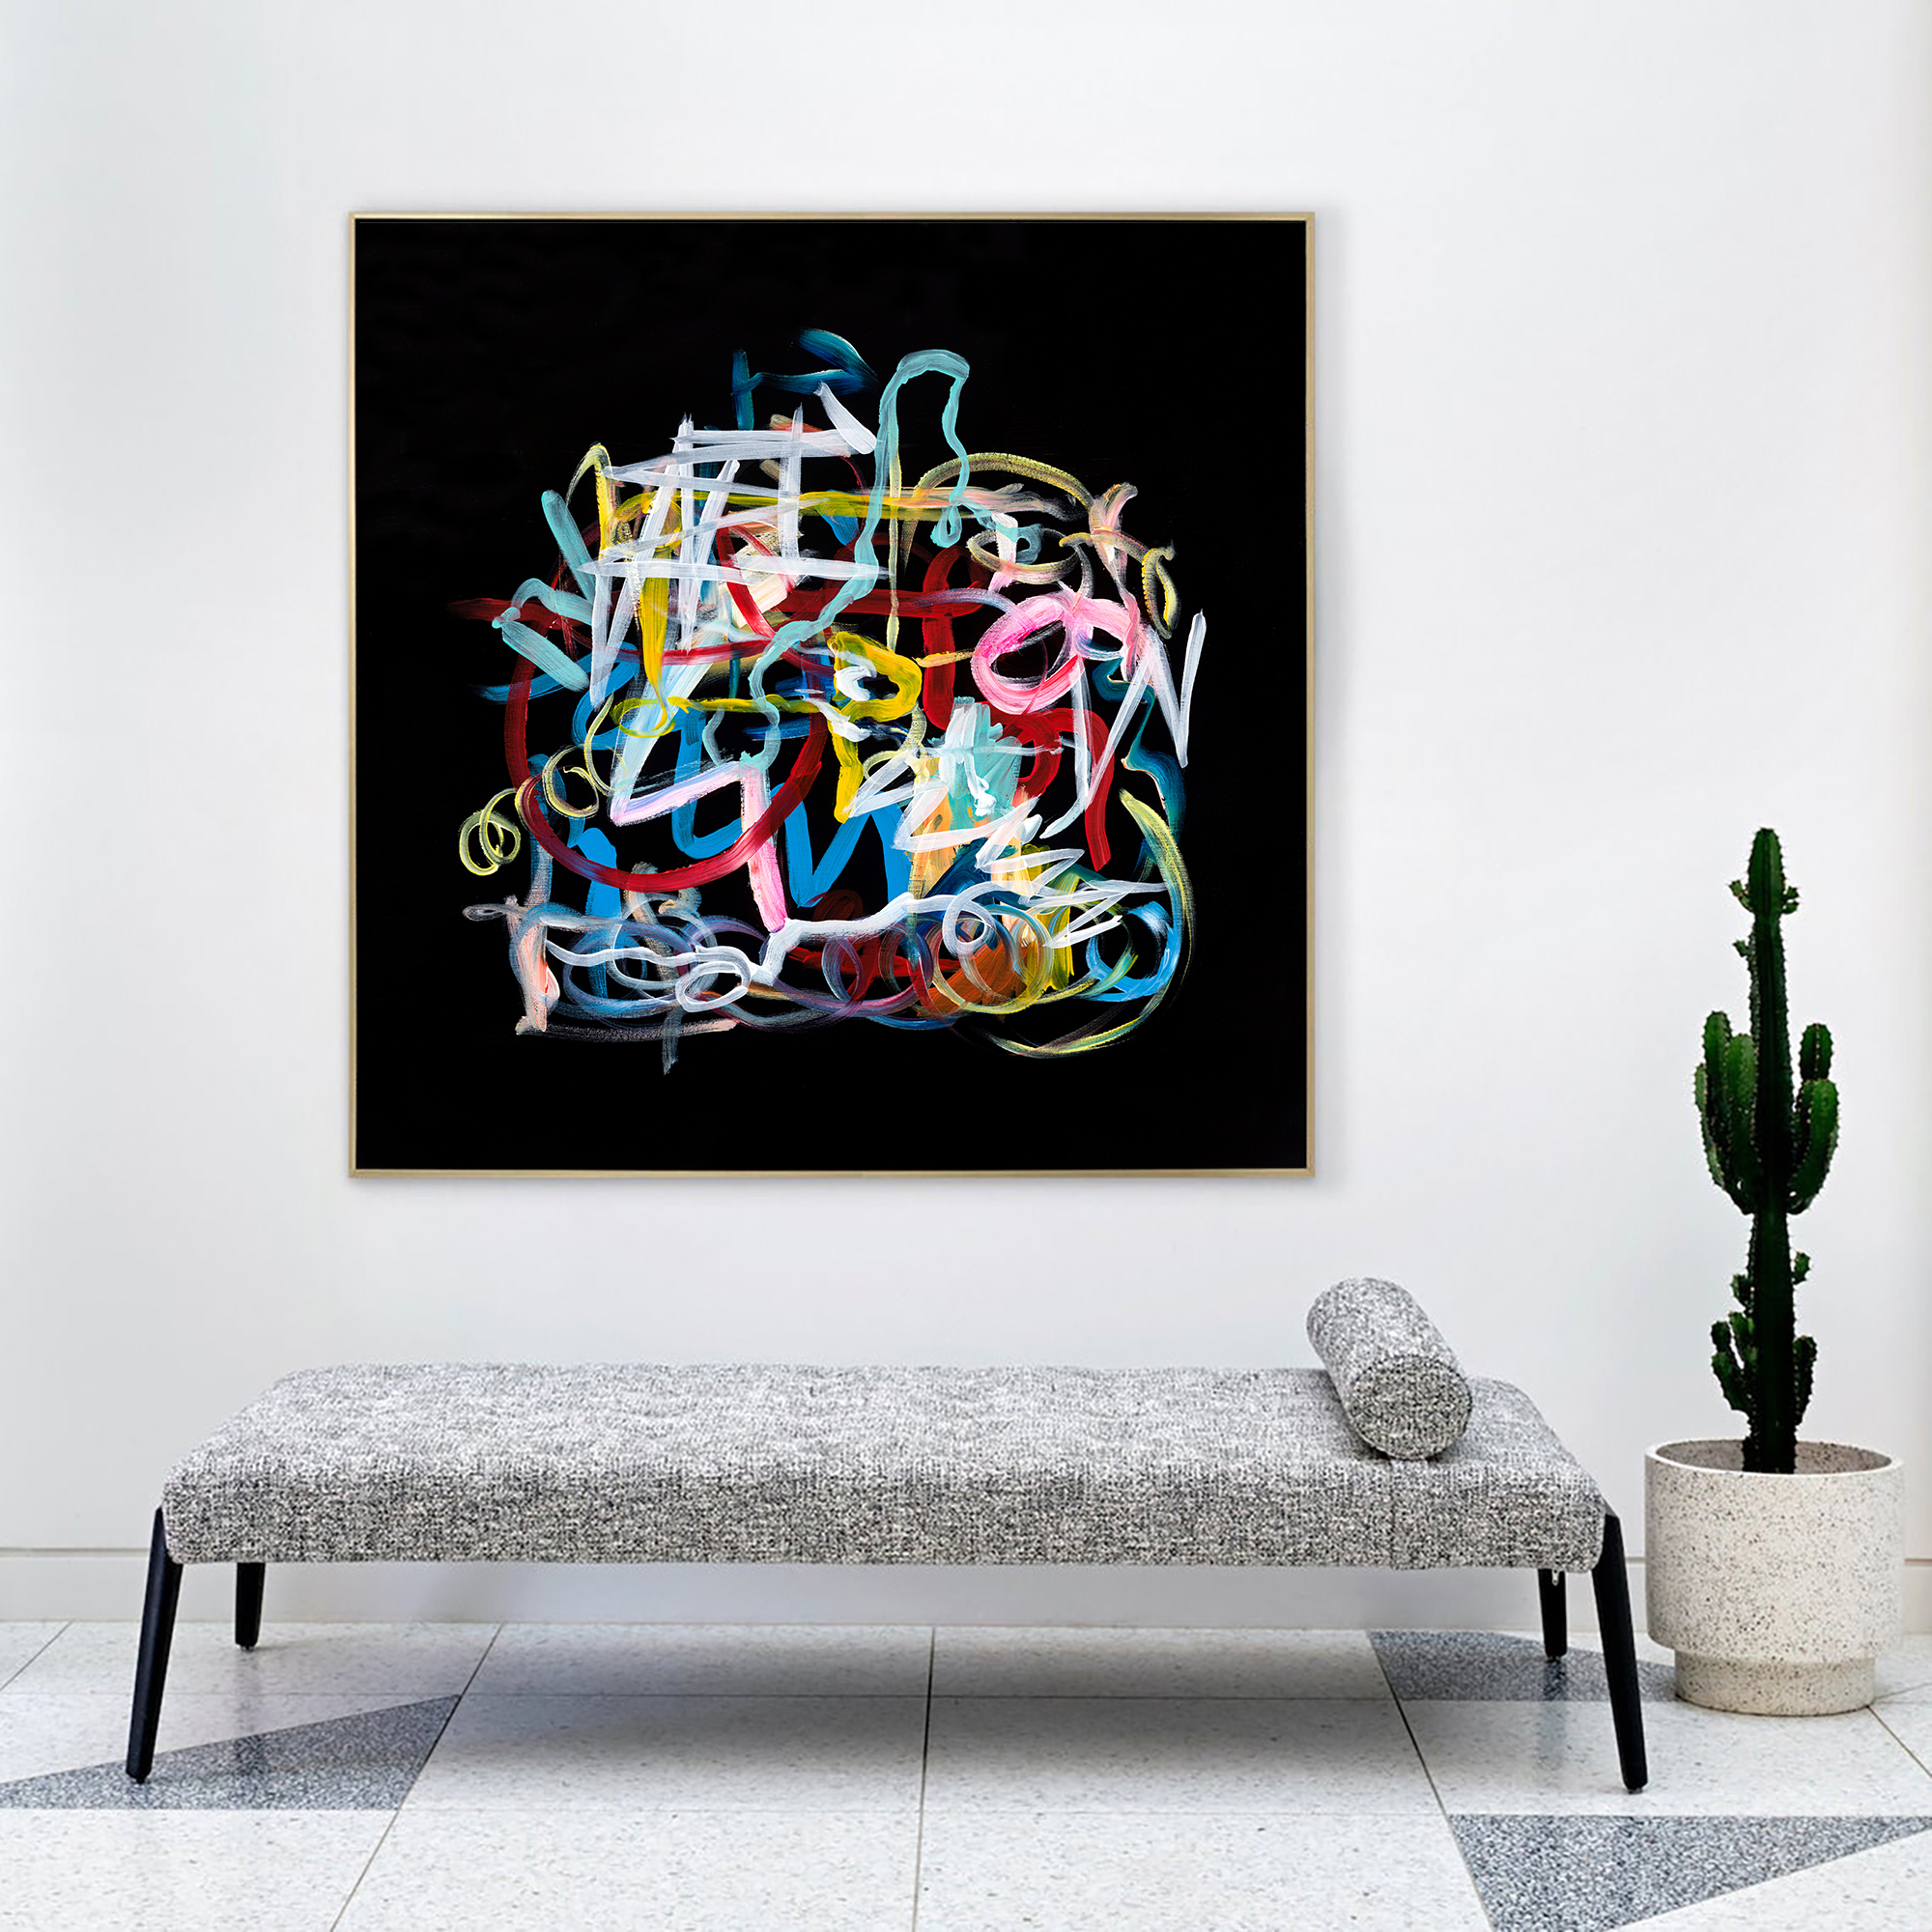 contemporary-art-abstract-painting-artwork-artist-ron-deri-art